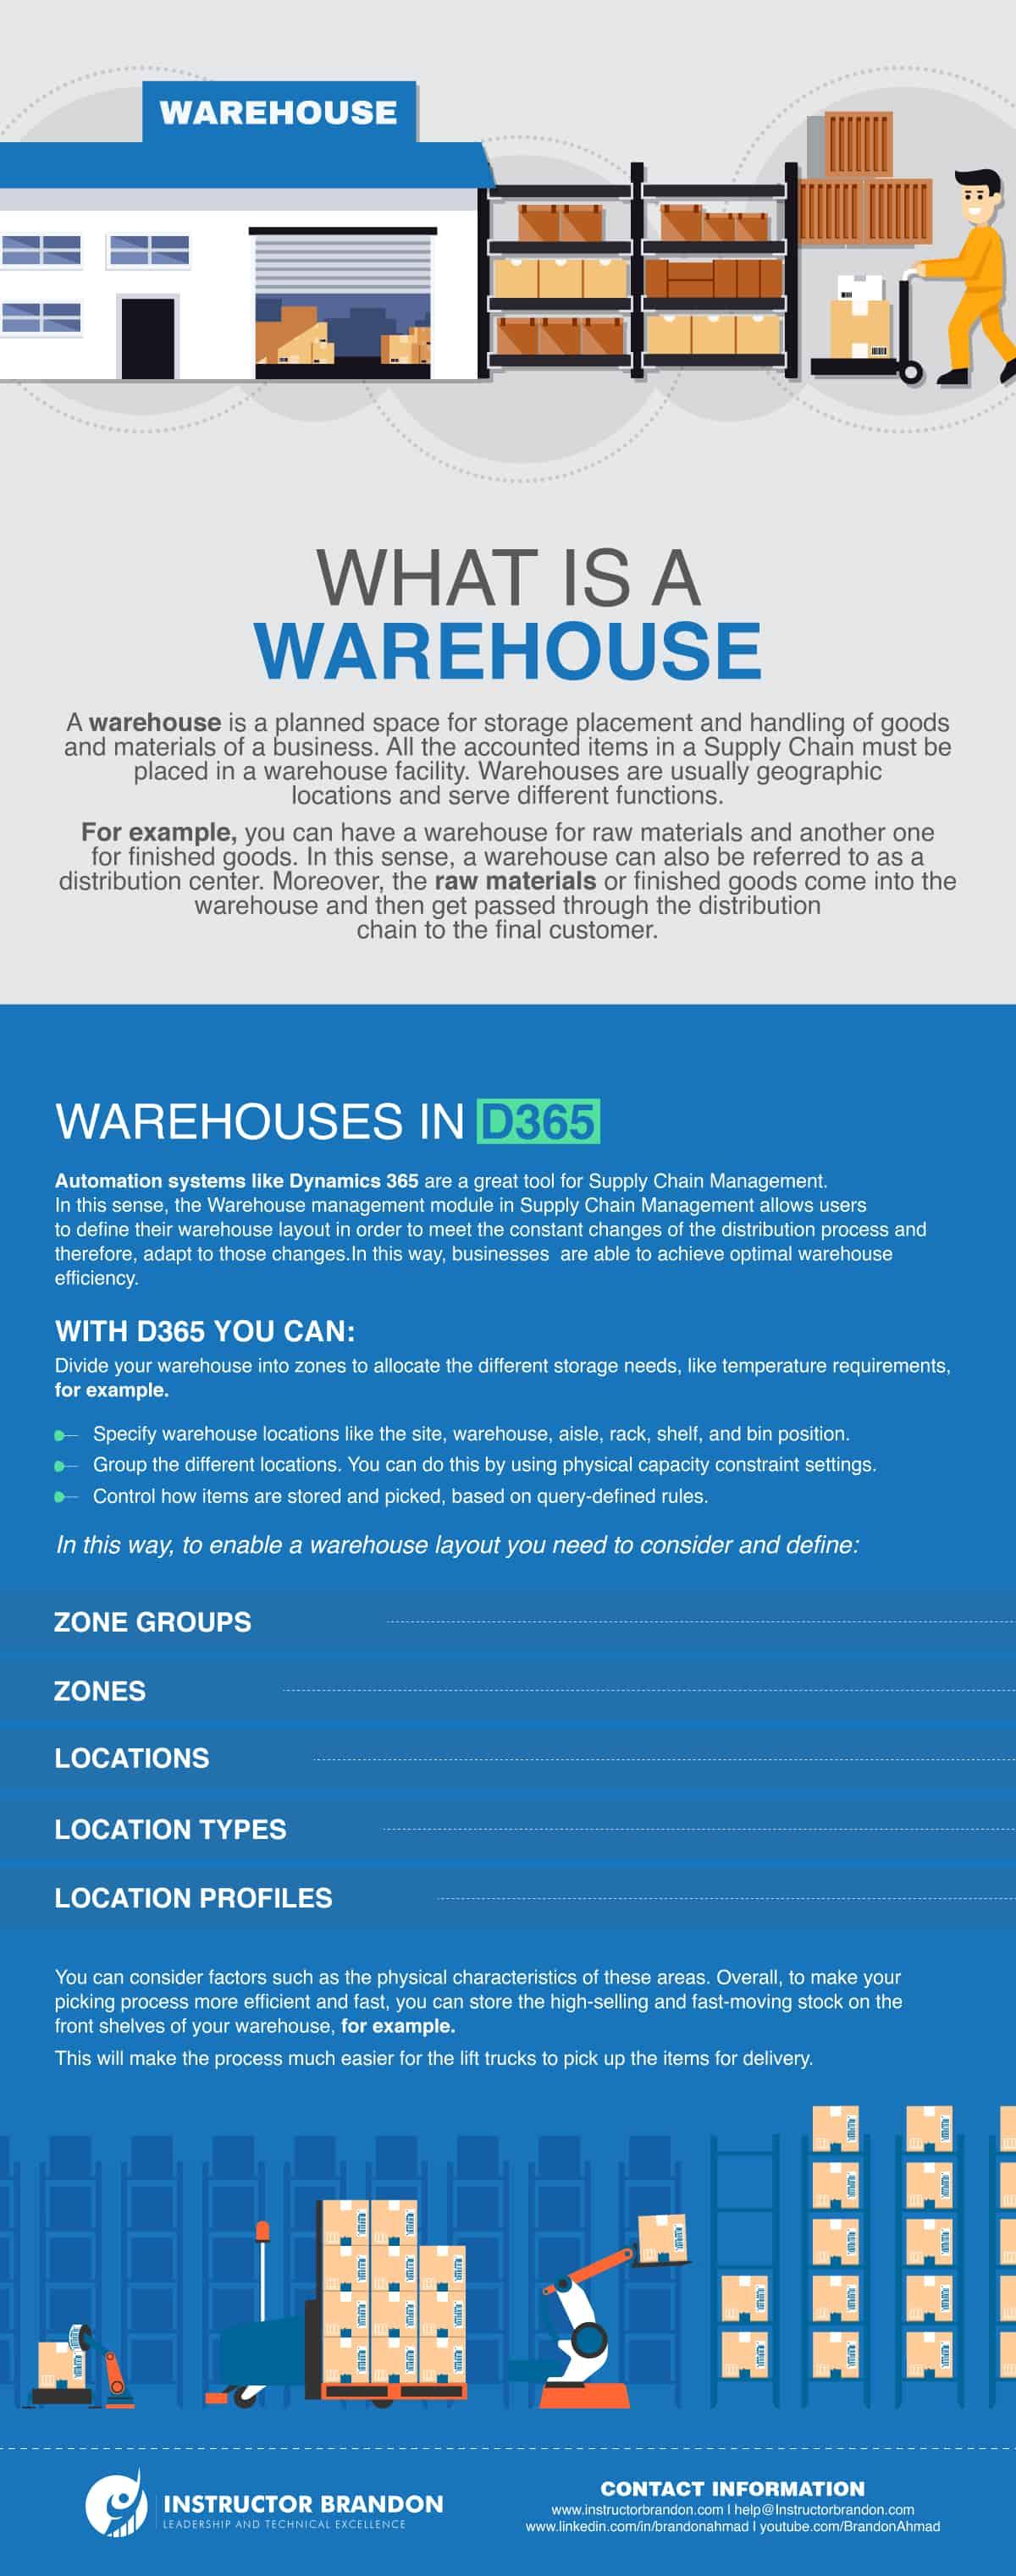 Warehouses in D365